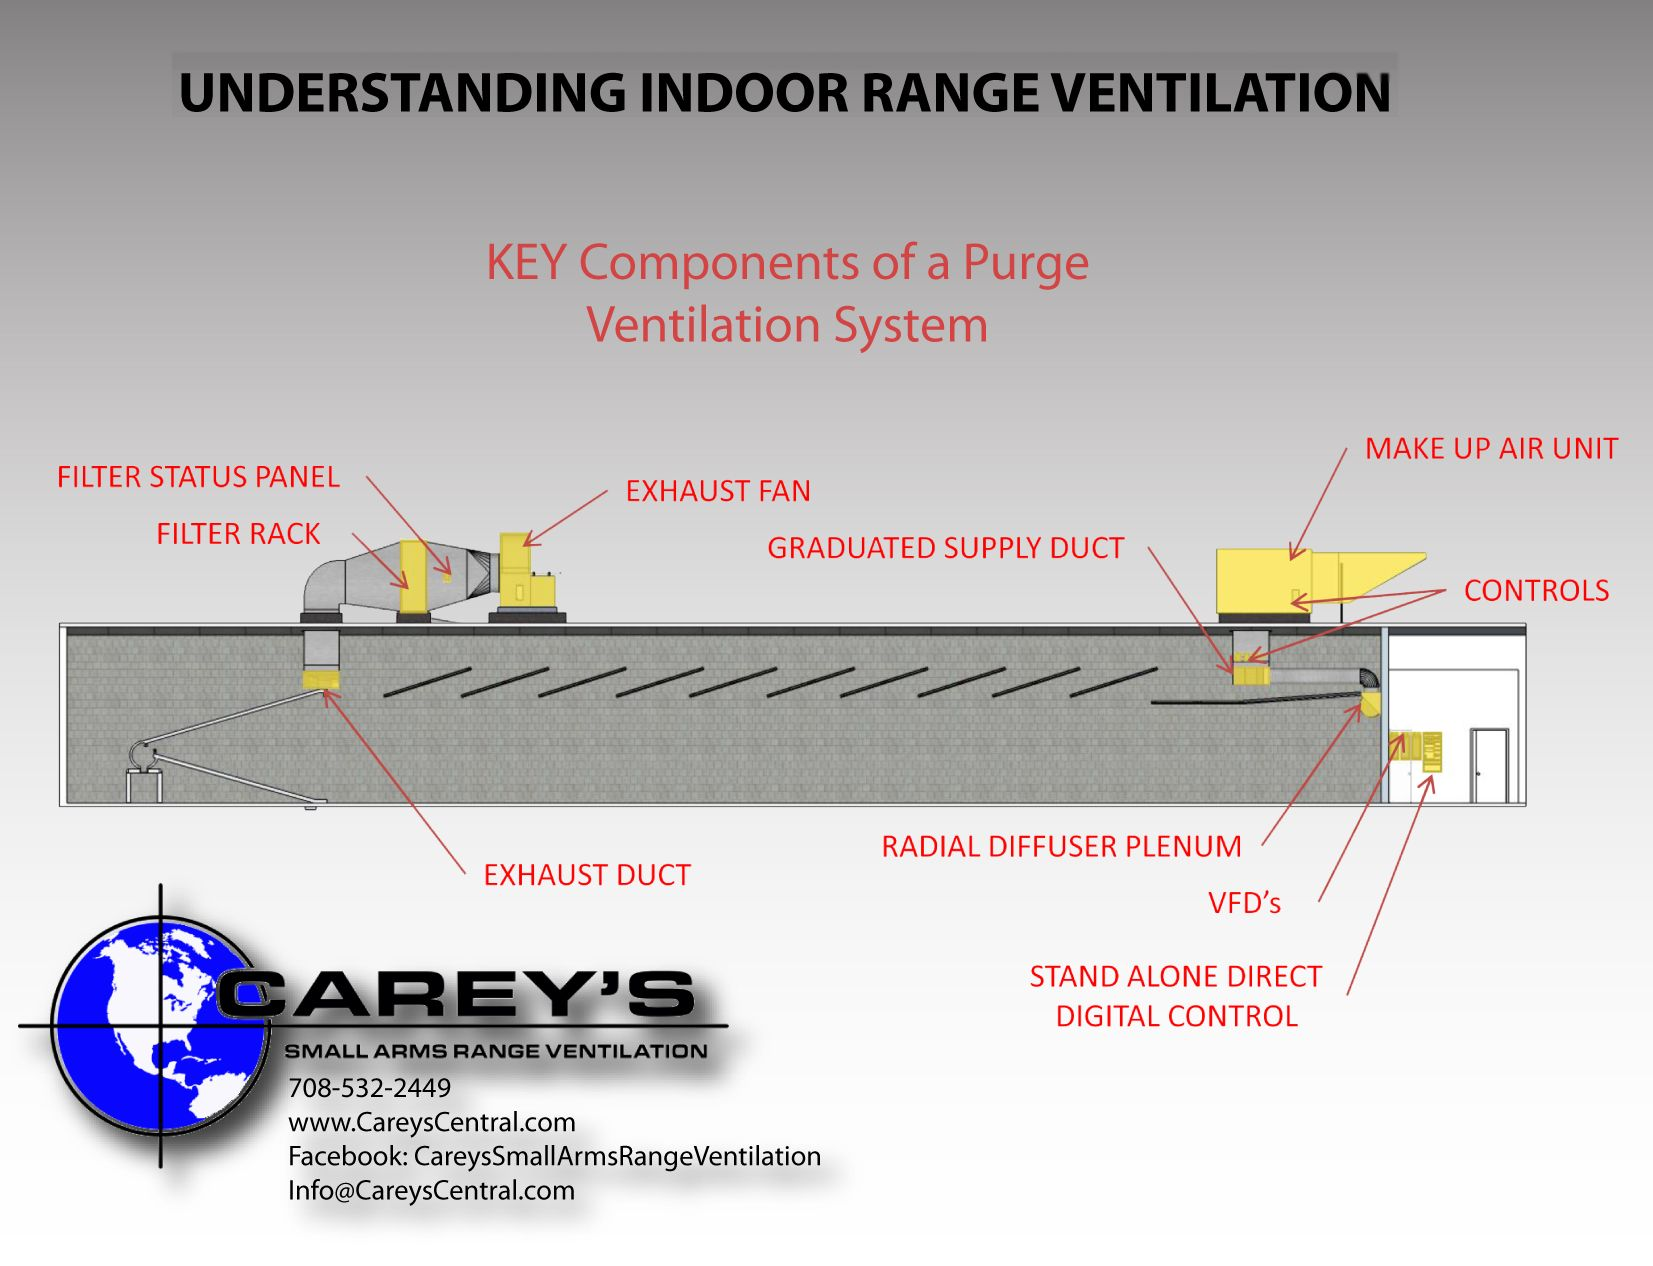 basics components of a purge indoor gun range ventilation system